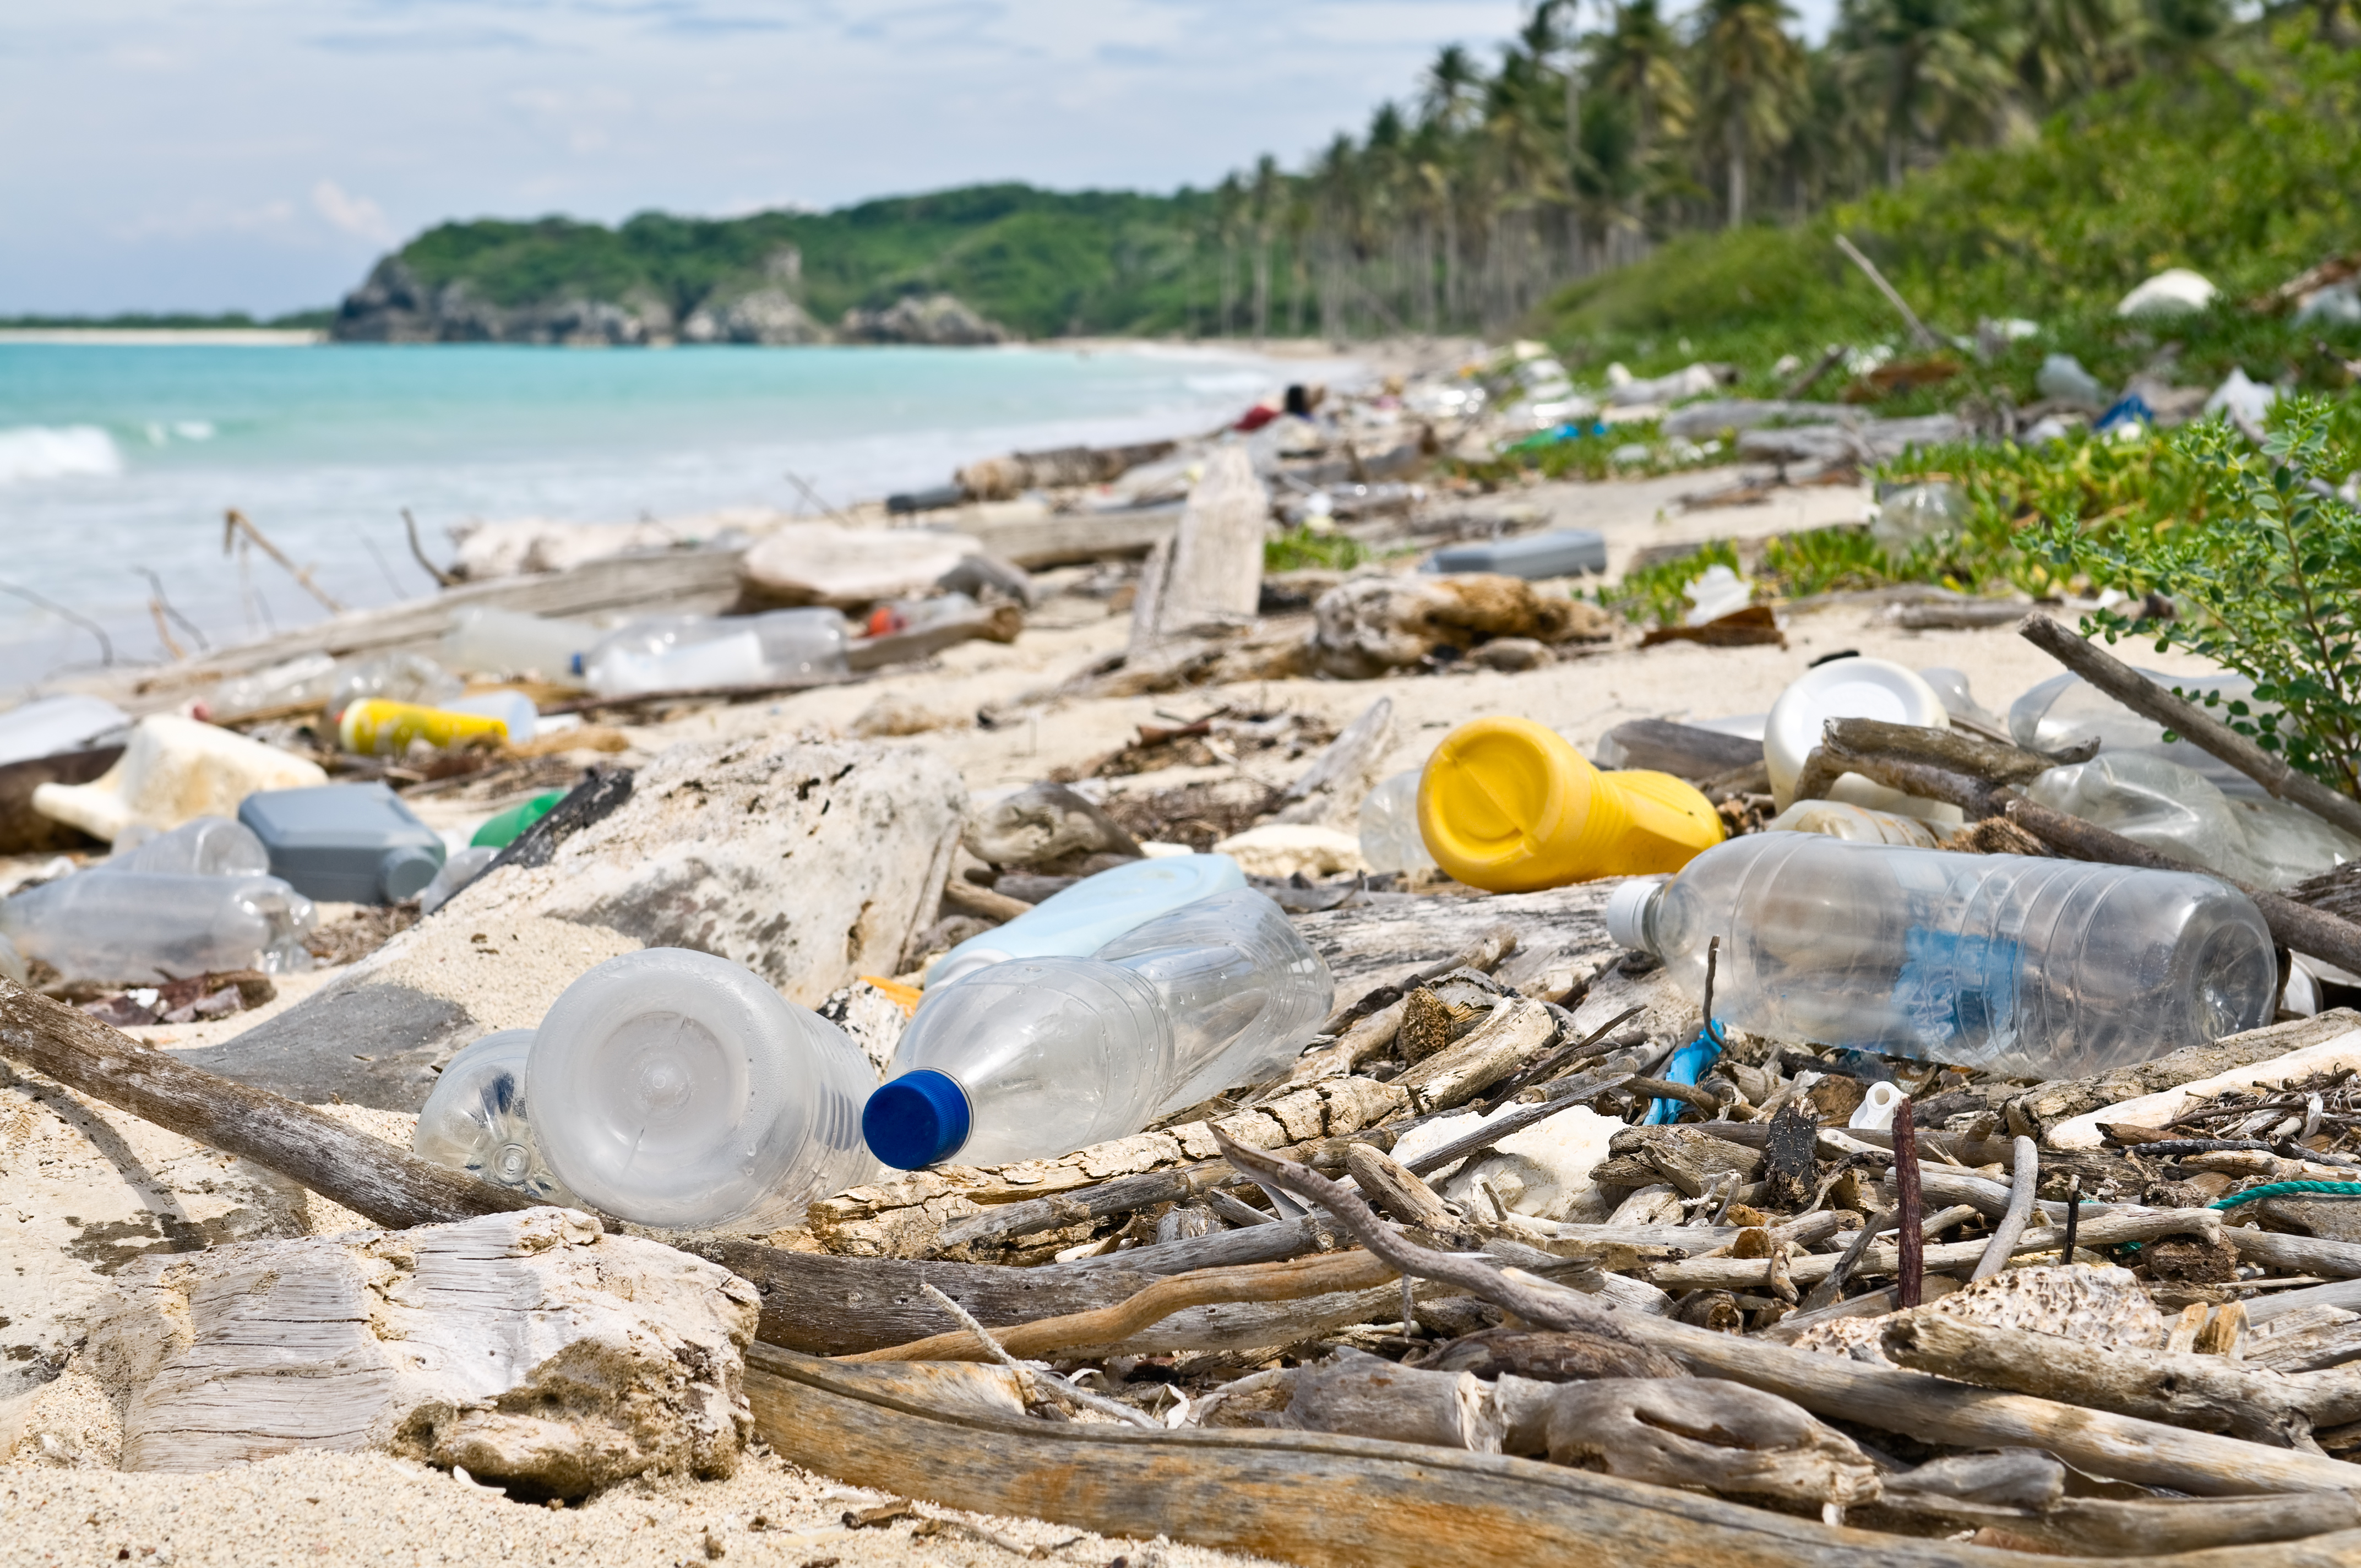 Plastic trash sullies a beautiful tropical beach